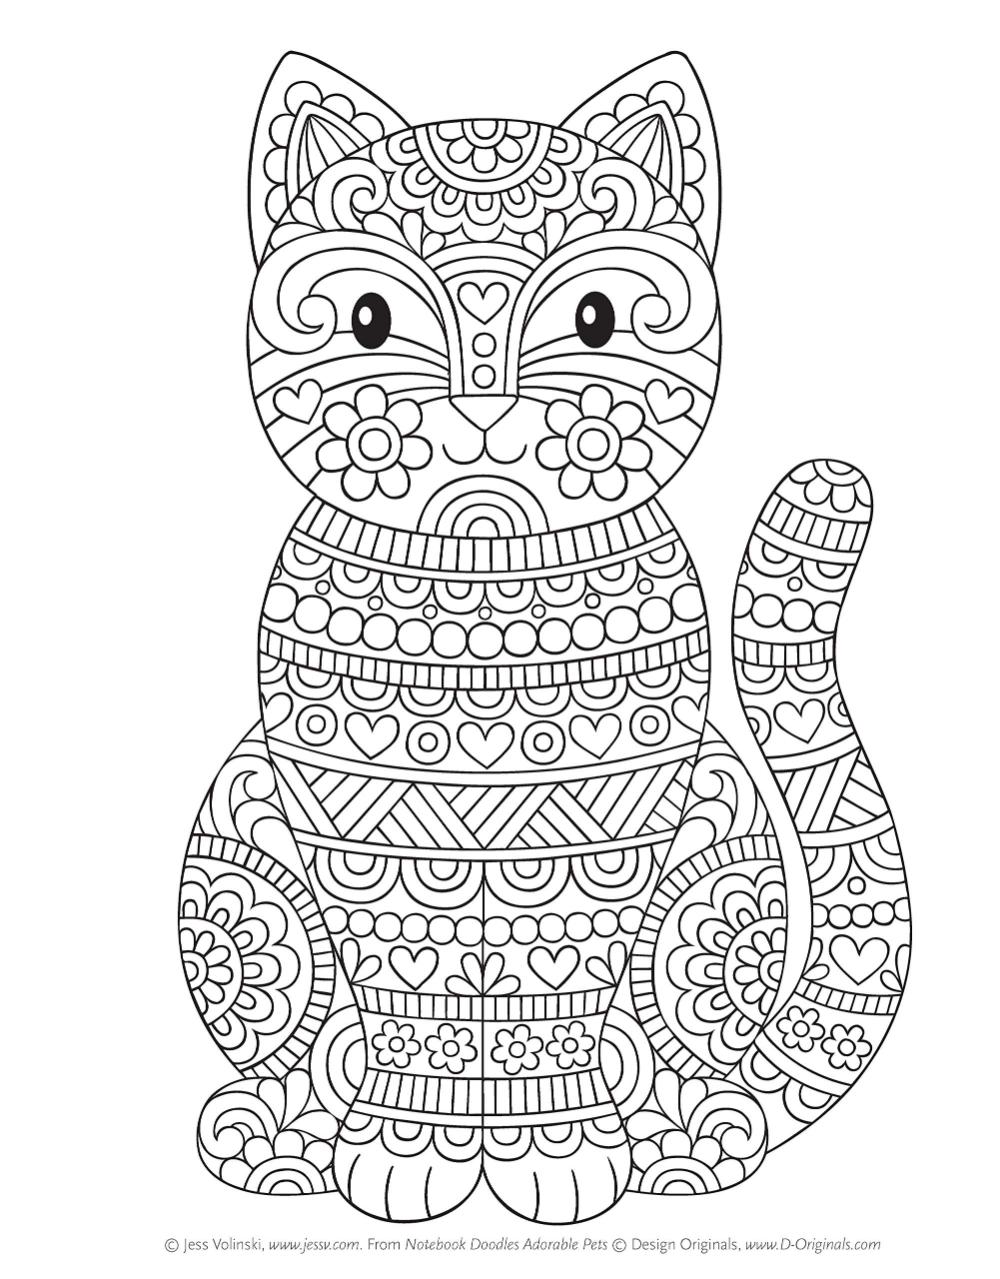 Amazon Com Notebook Doodles Adorable Pets Coloring Activity Book Design Originals 32 Dazzling Designs From Dogs Cats To Hedgeh Knizhka Raskraska Raskraski S Zhivotnymi I Besplatnye Raskraski